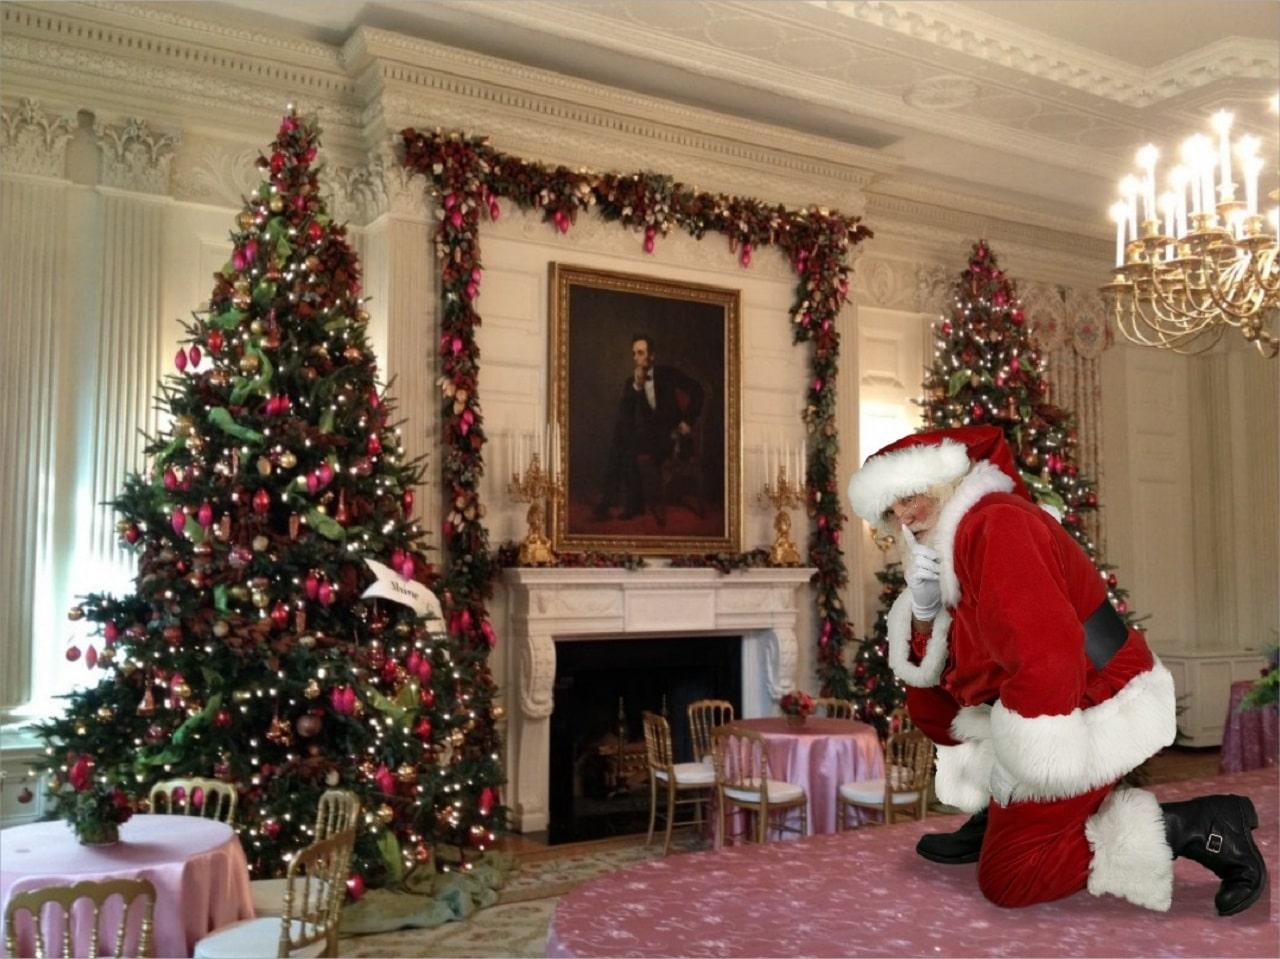 Un Santa Claus